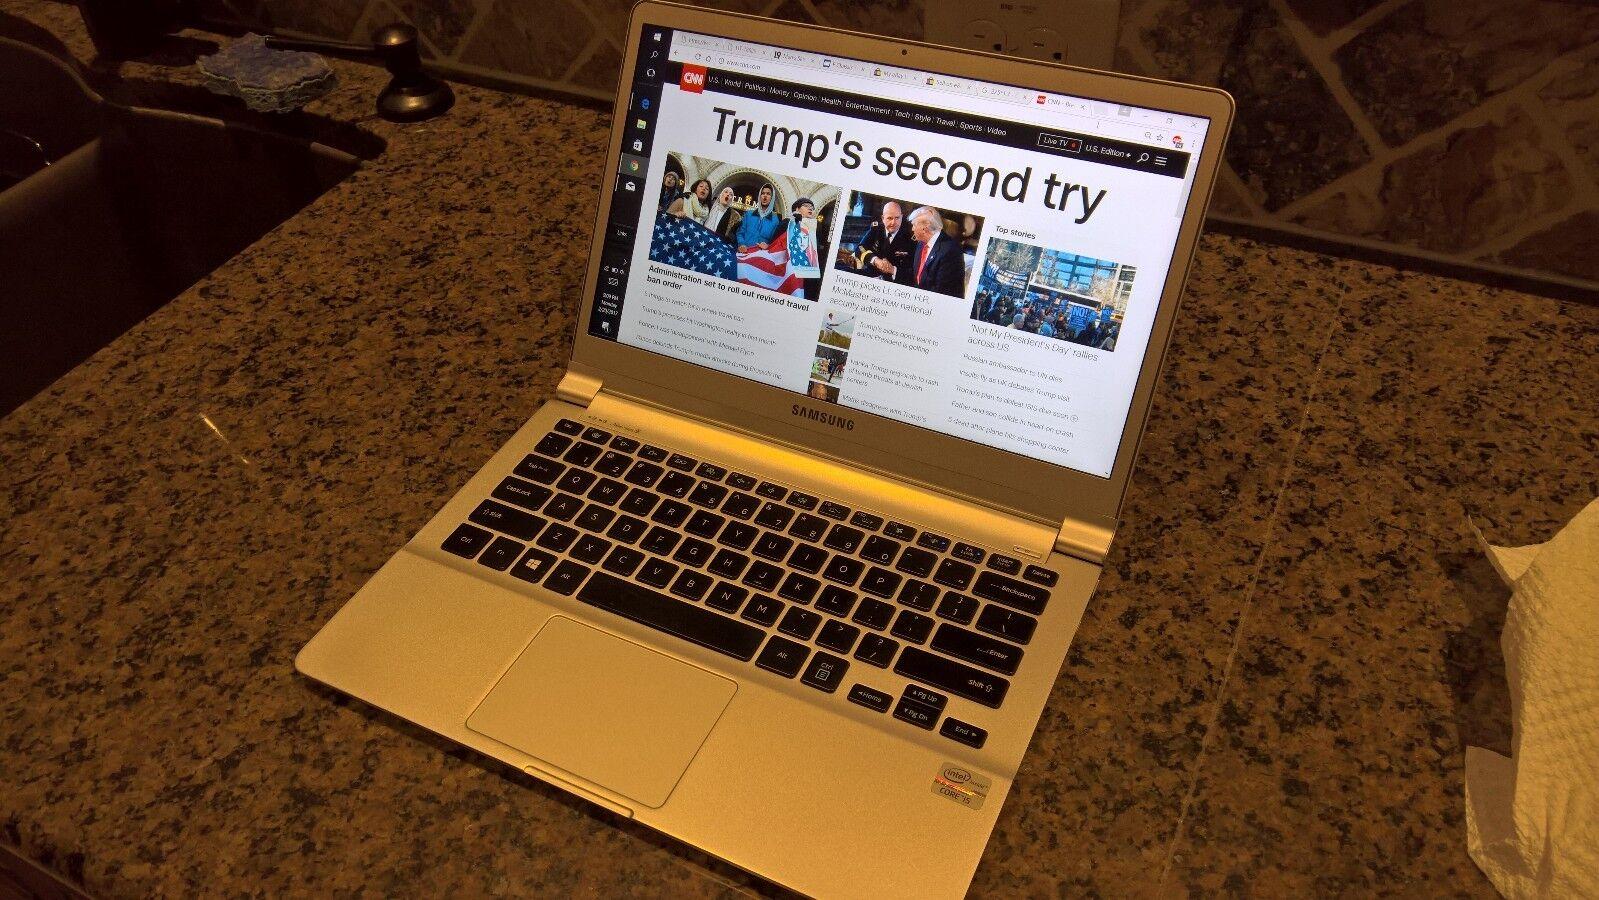 Samsung Series 9 NP900X3D Laptop Ultrabook Core i5 128GB SSD 4GB RAM Good Cond.